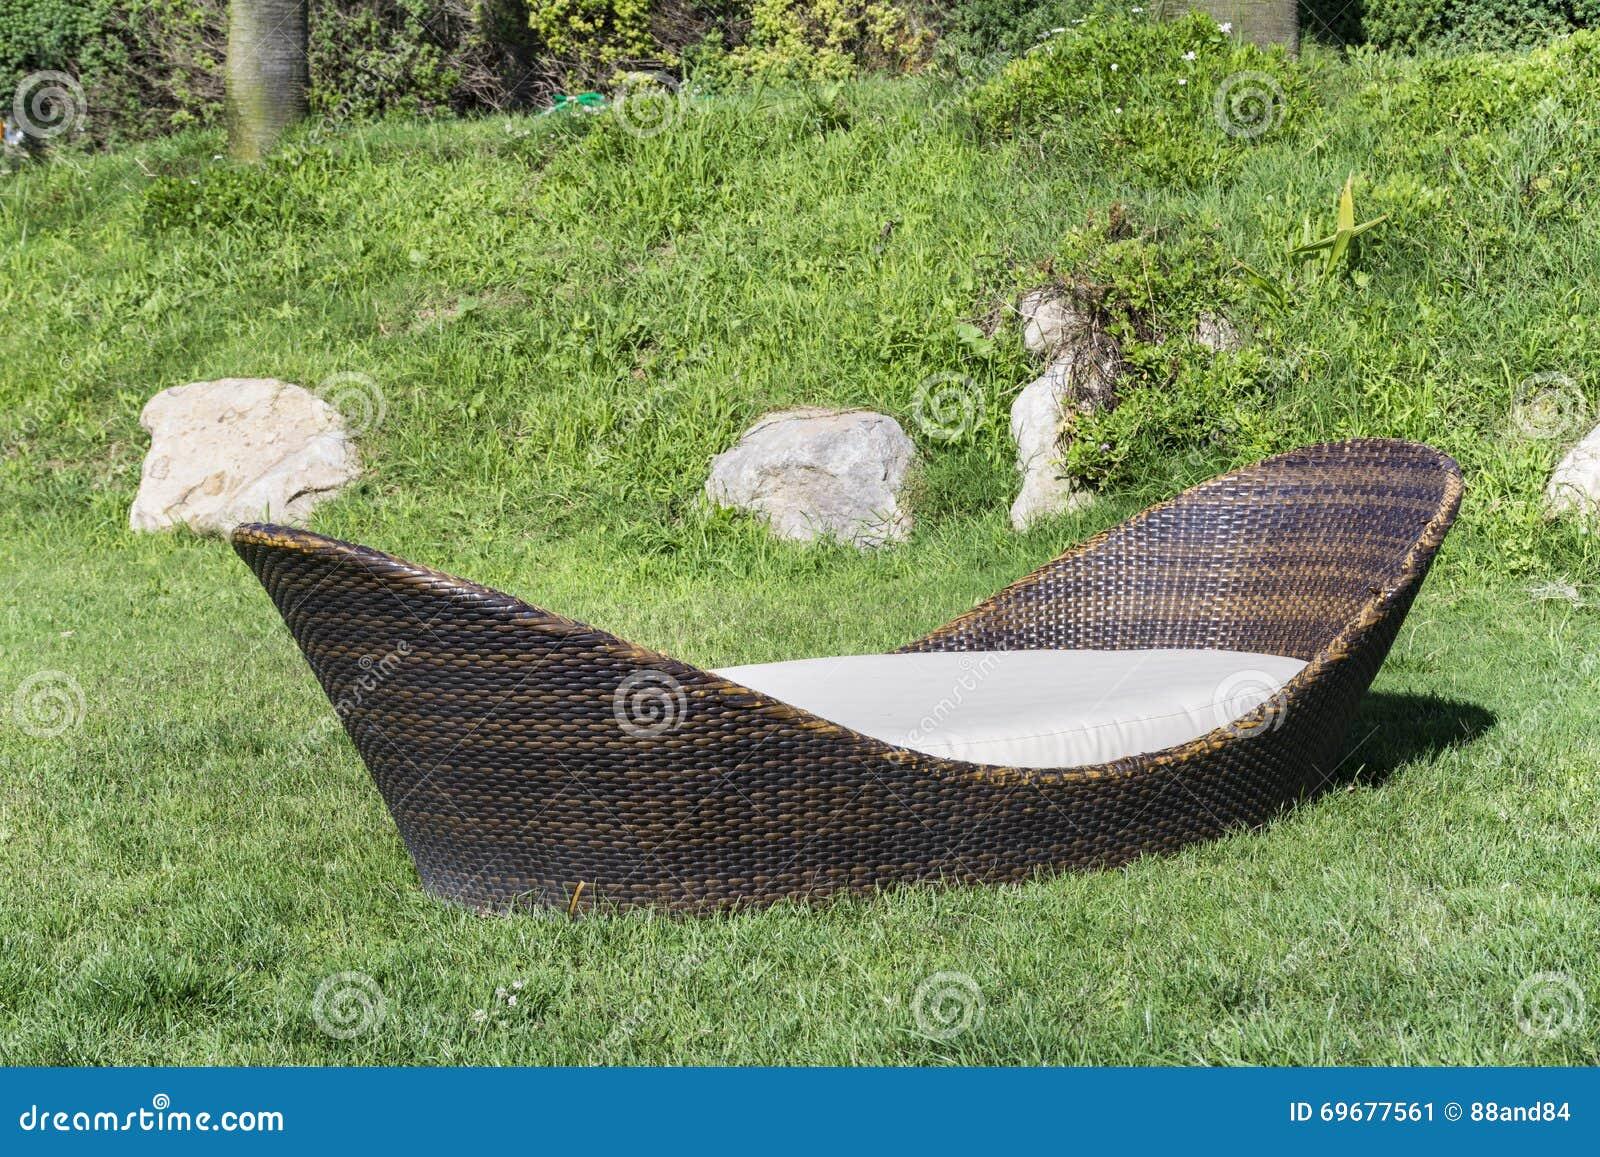 Lit Pliant De Rotin De Salon Dans Un Jardin Vert Image stock ...